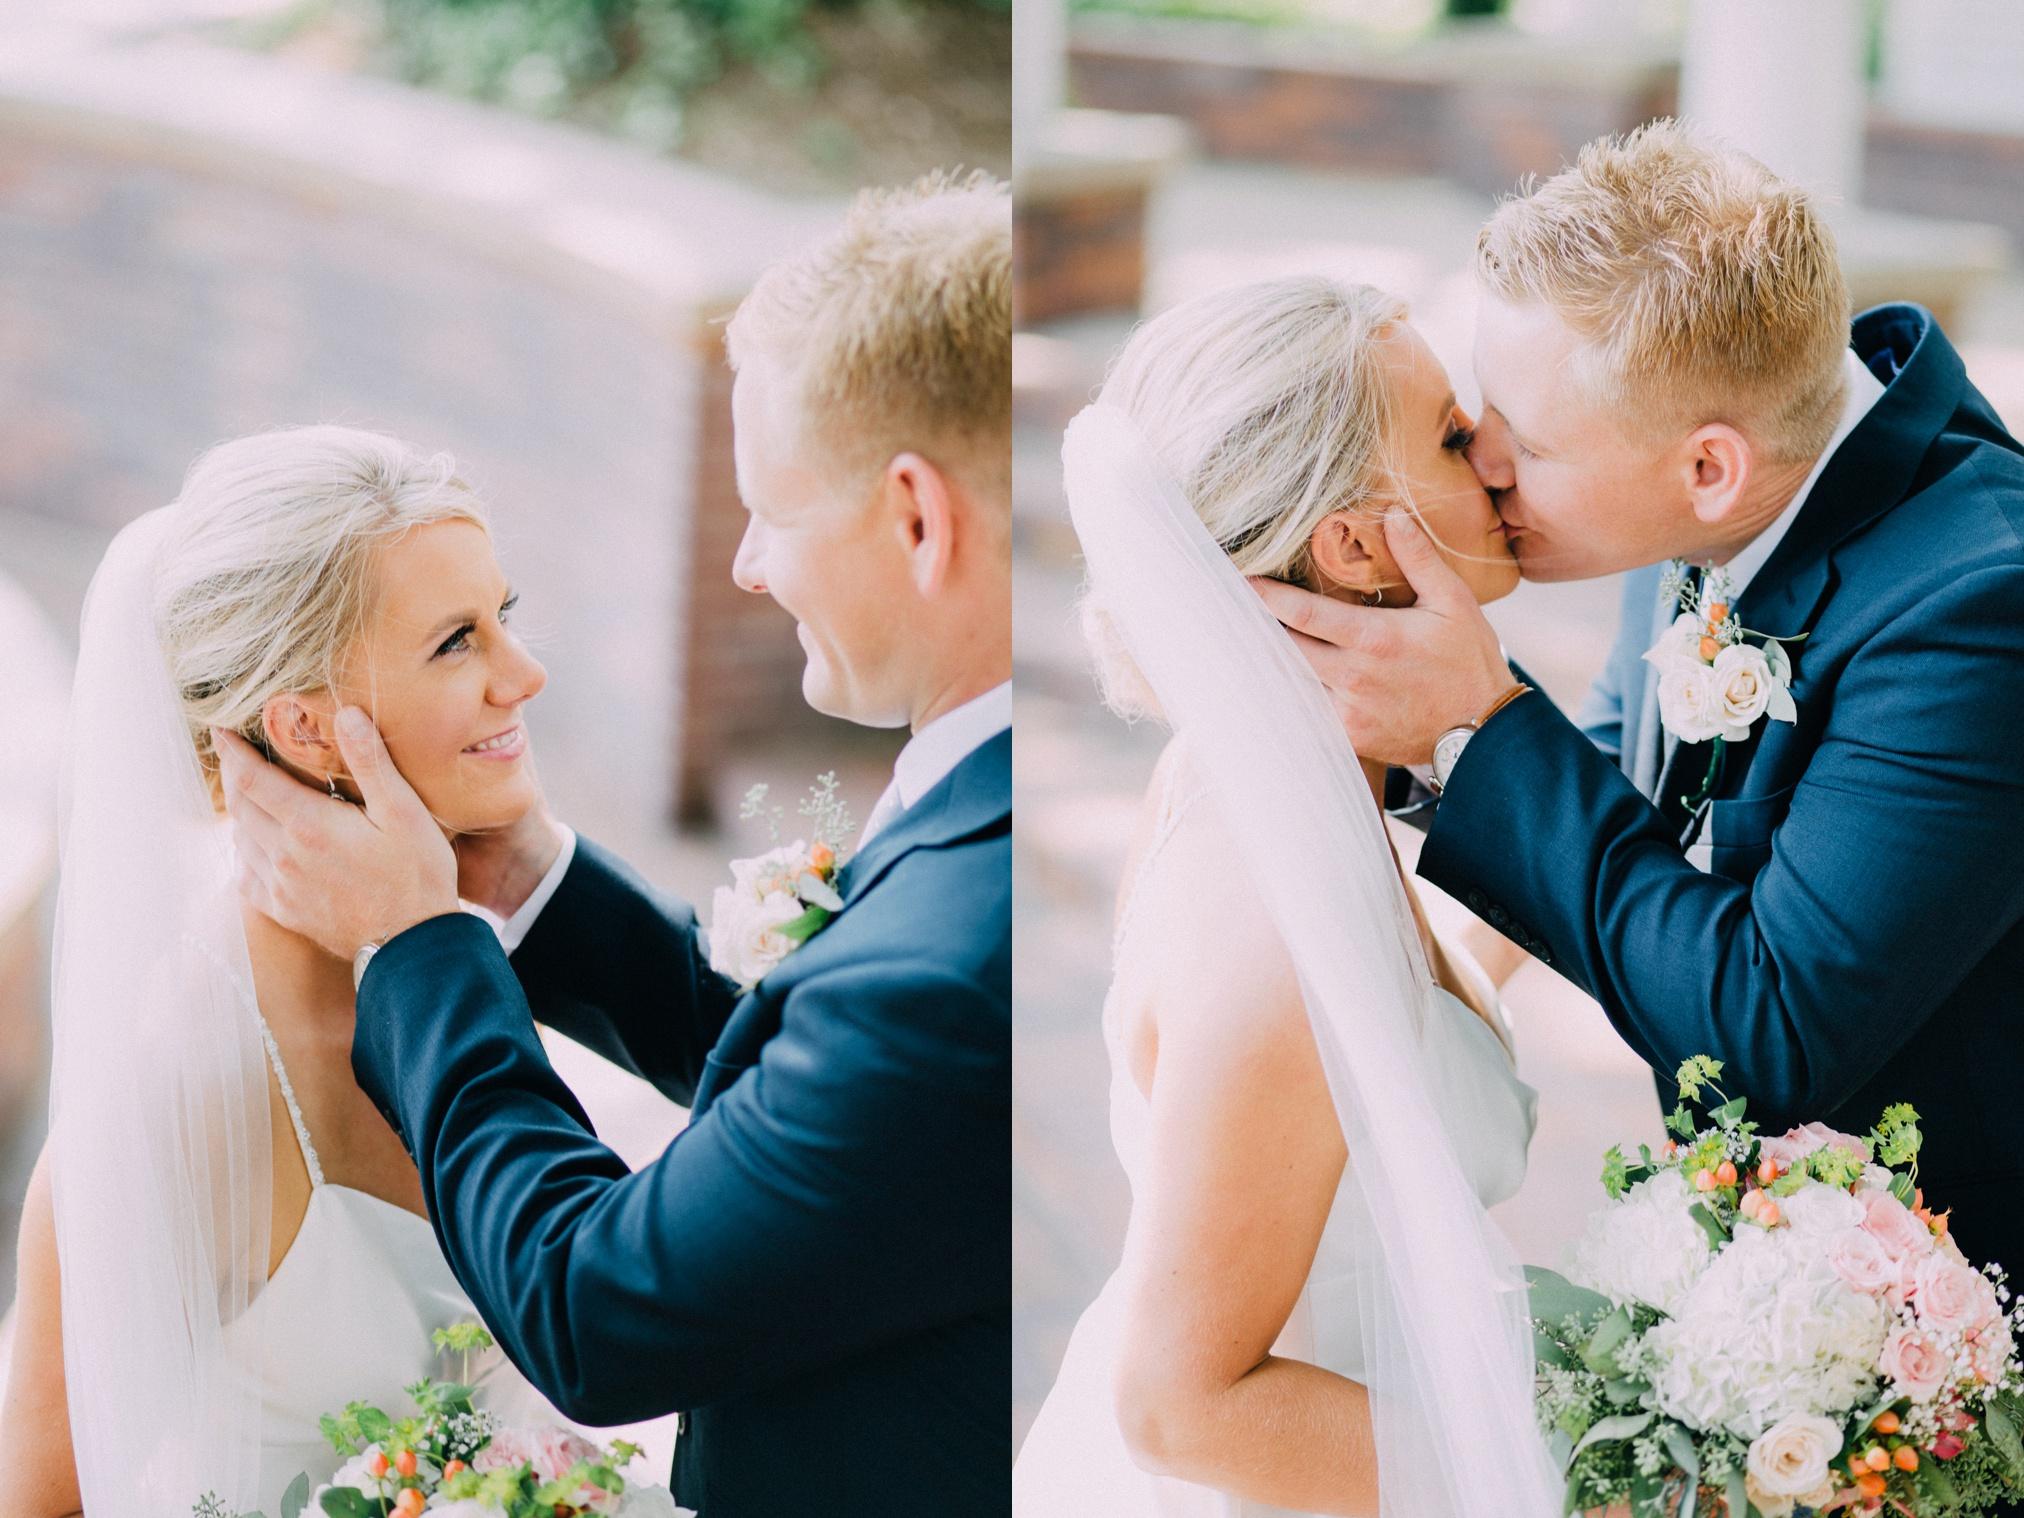 brenna+michael_wedding-286.jpg